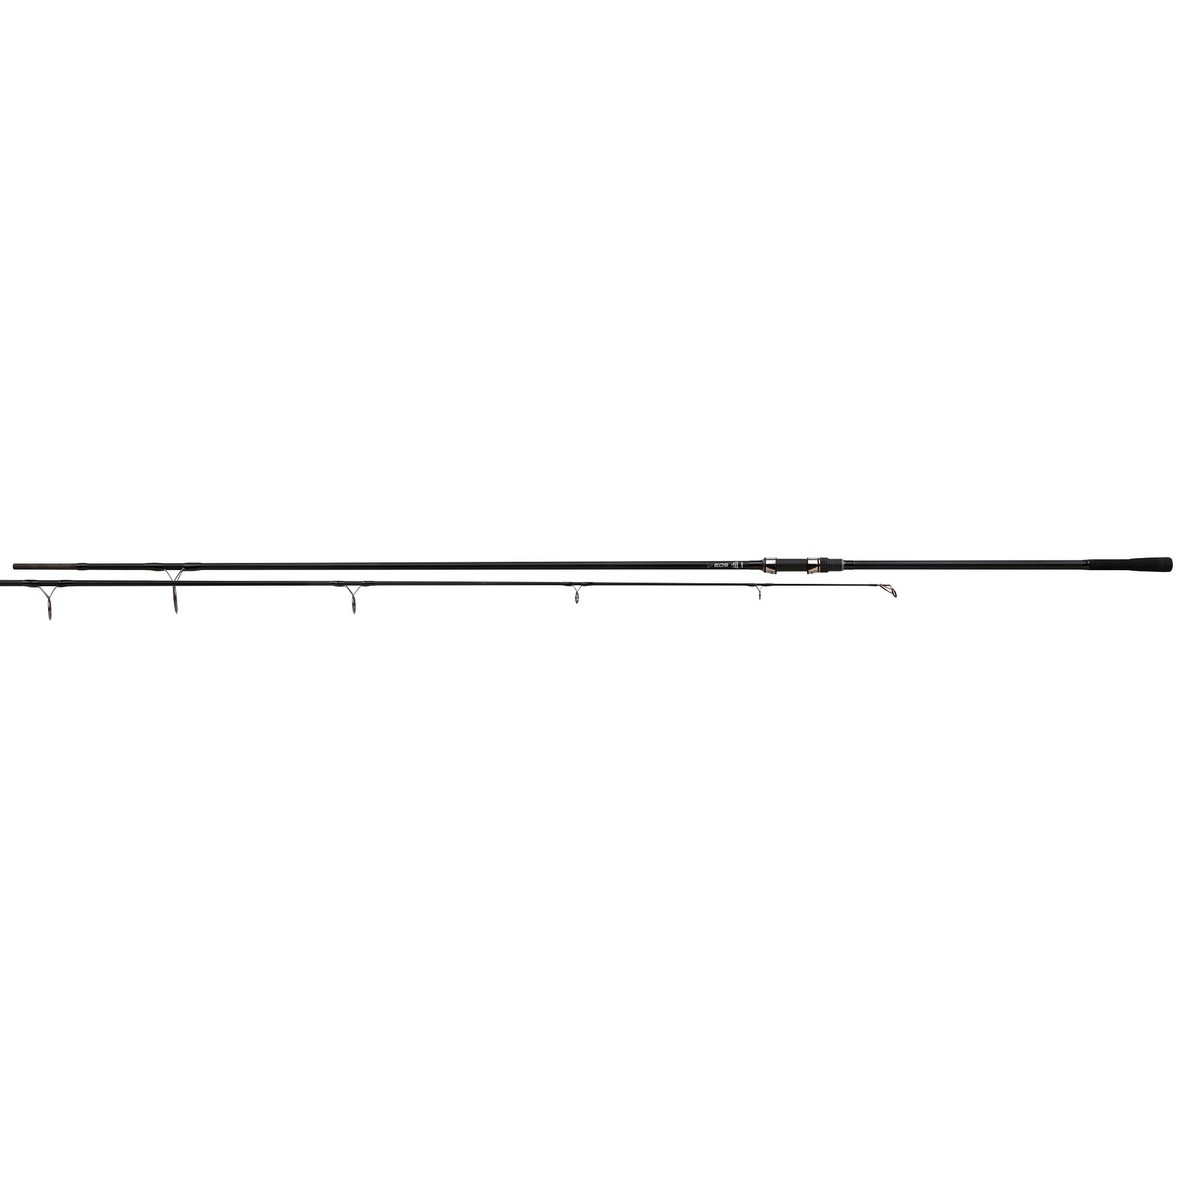 FOX EOS Spod and Marker Rod 3.60m/5lb